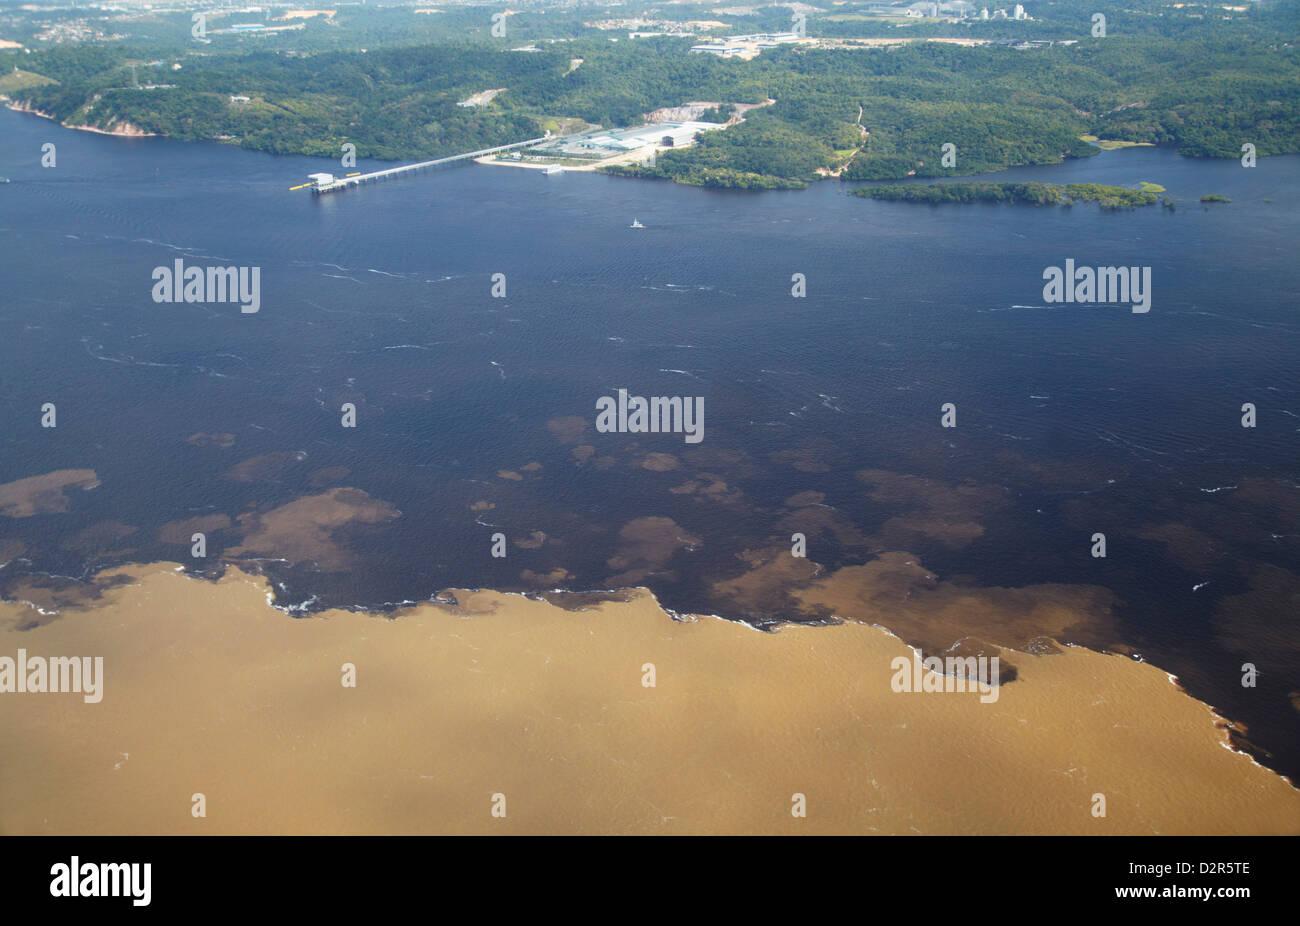 Aerial view of Encontro das Aguas, meeting of the Rio Negro and Rio Solimoes, Manaus, Amazonas, Brazil, South America - Stock Image